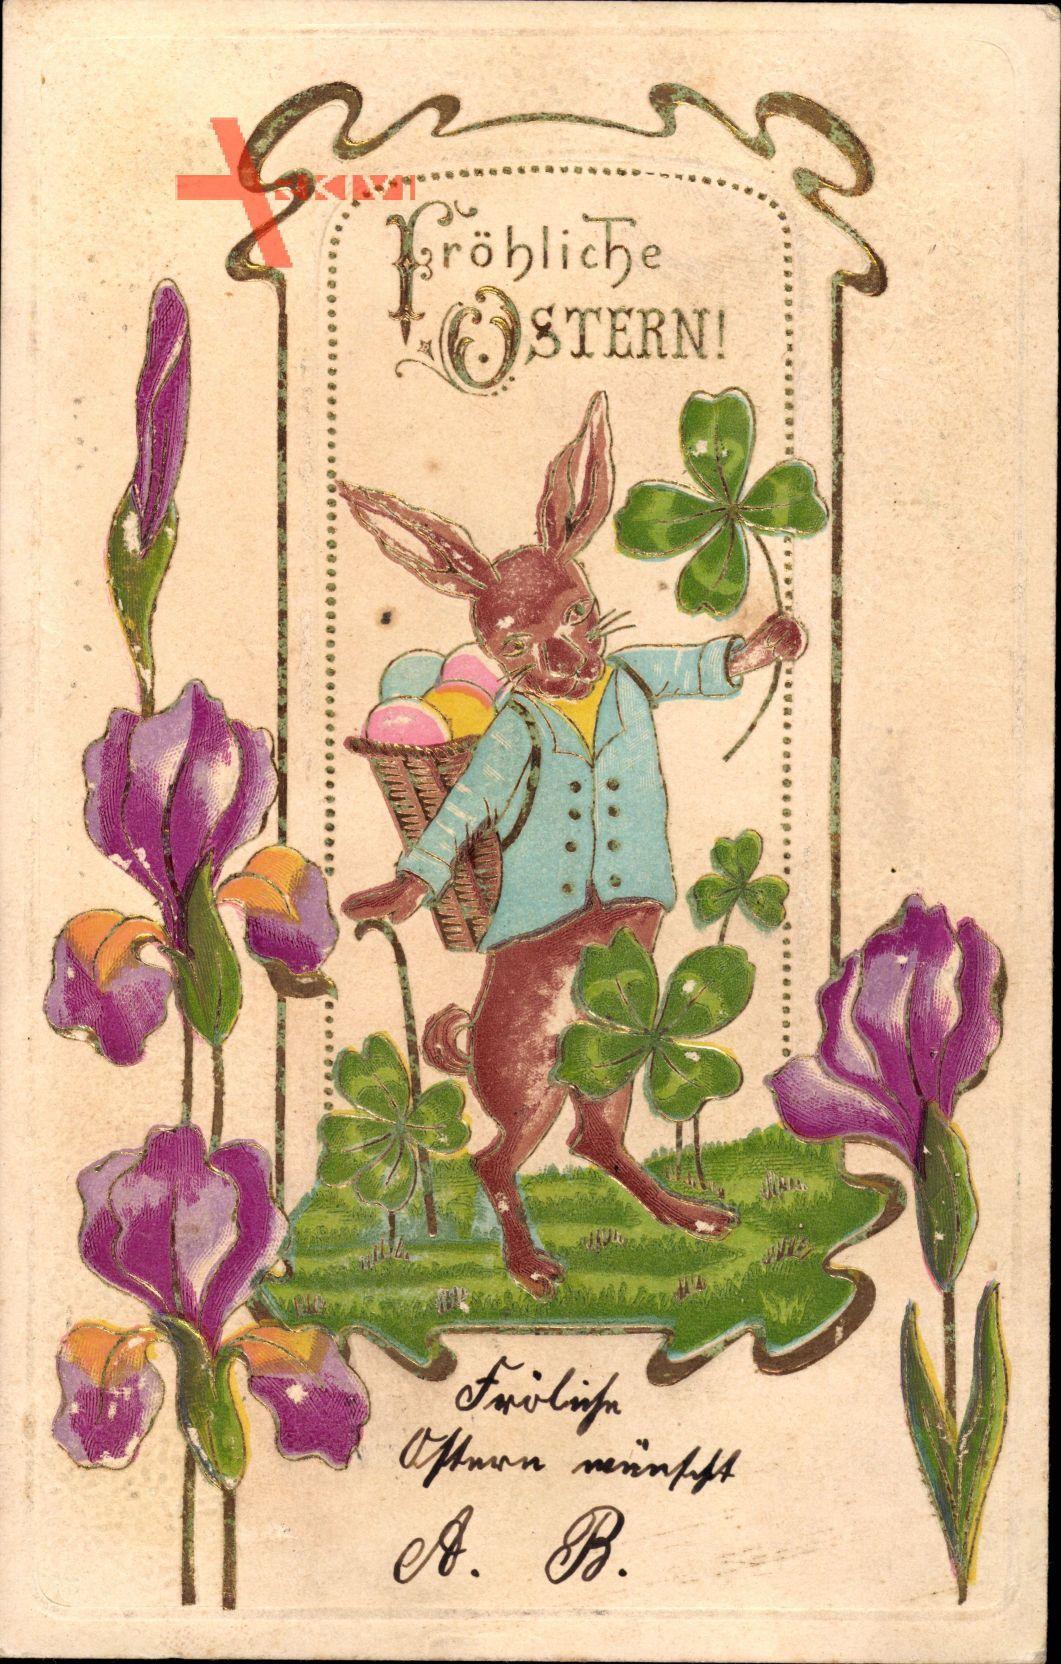 Glückwunsch Ostern, Osterhase, Kleeblätter